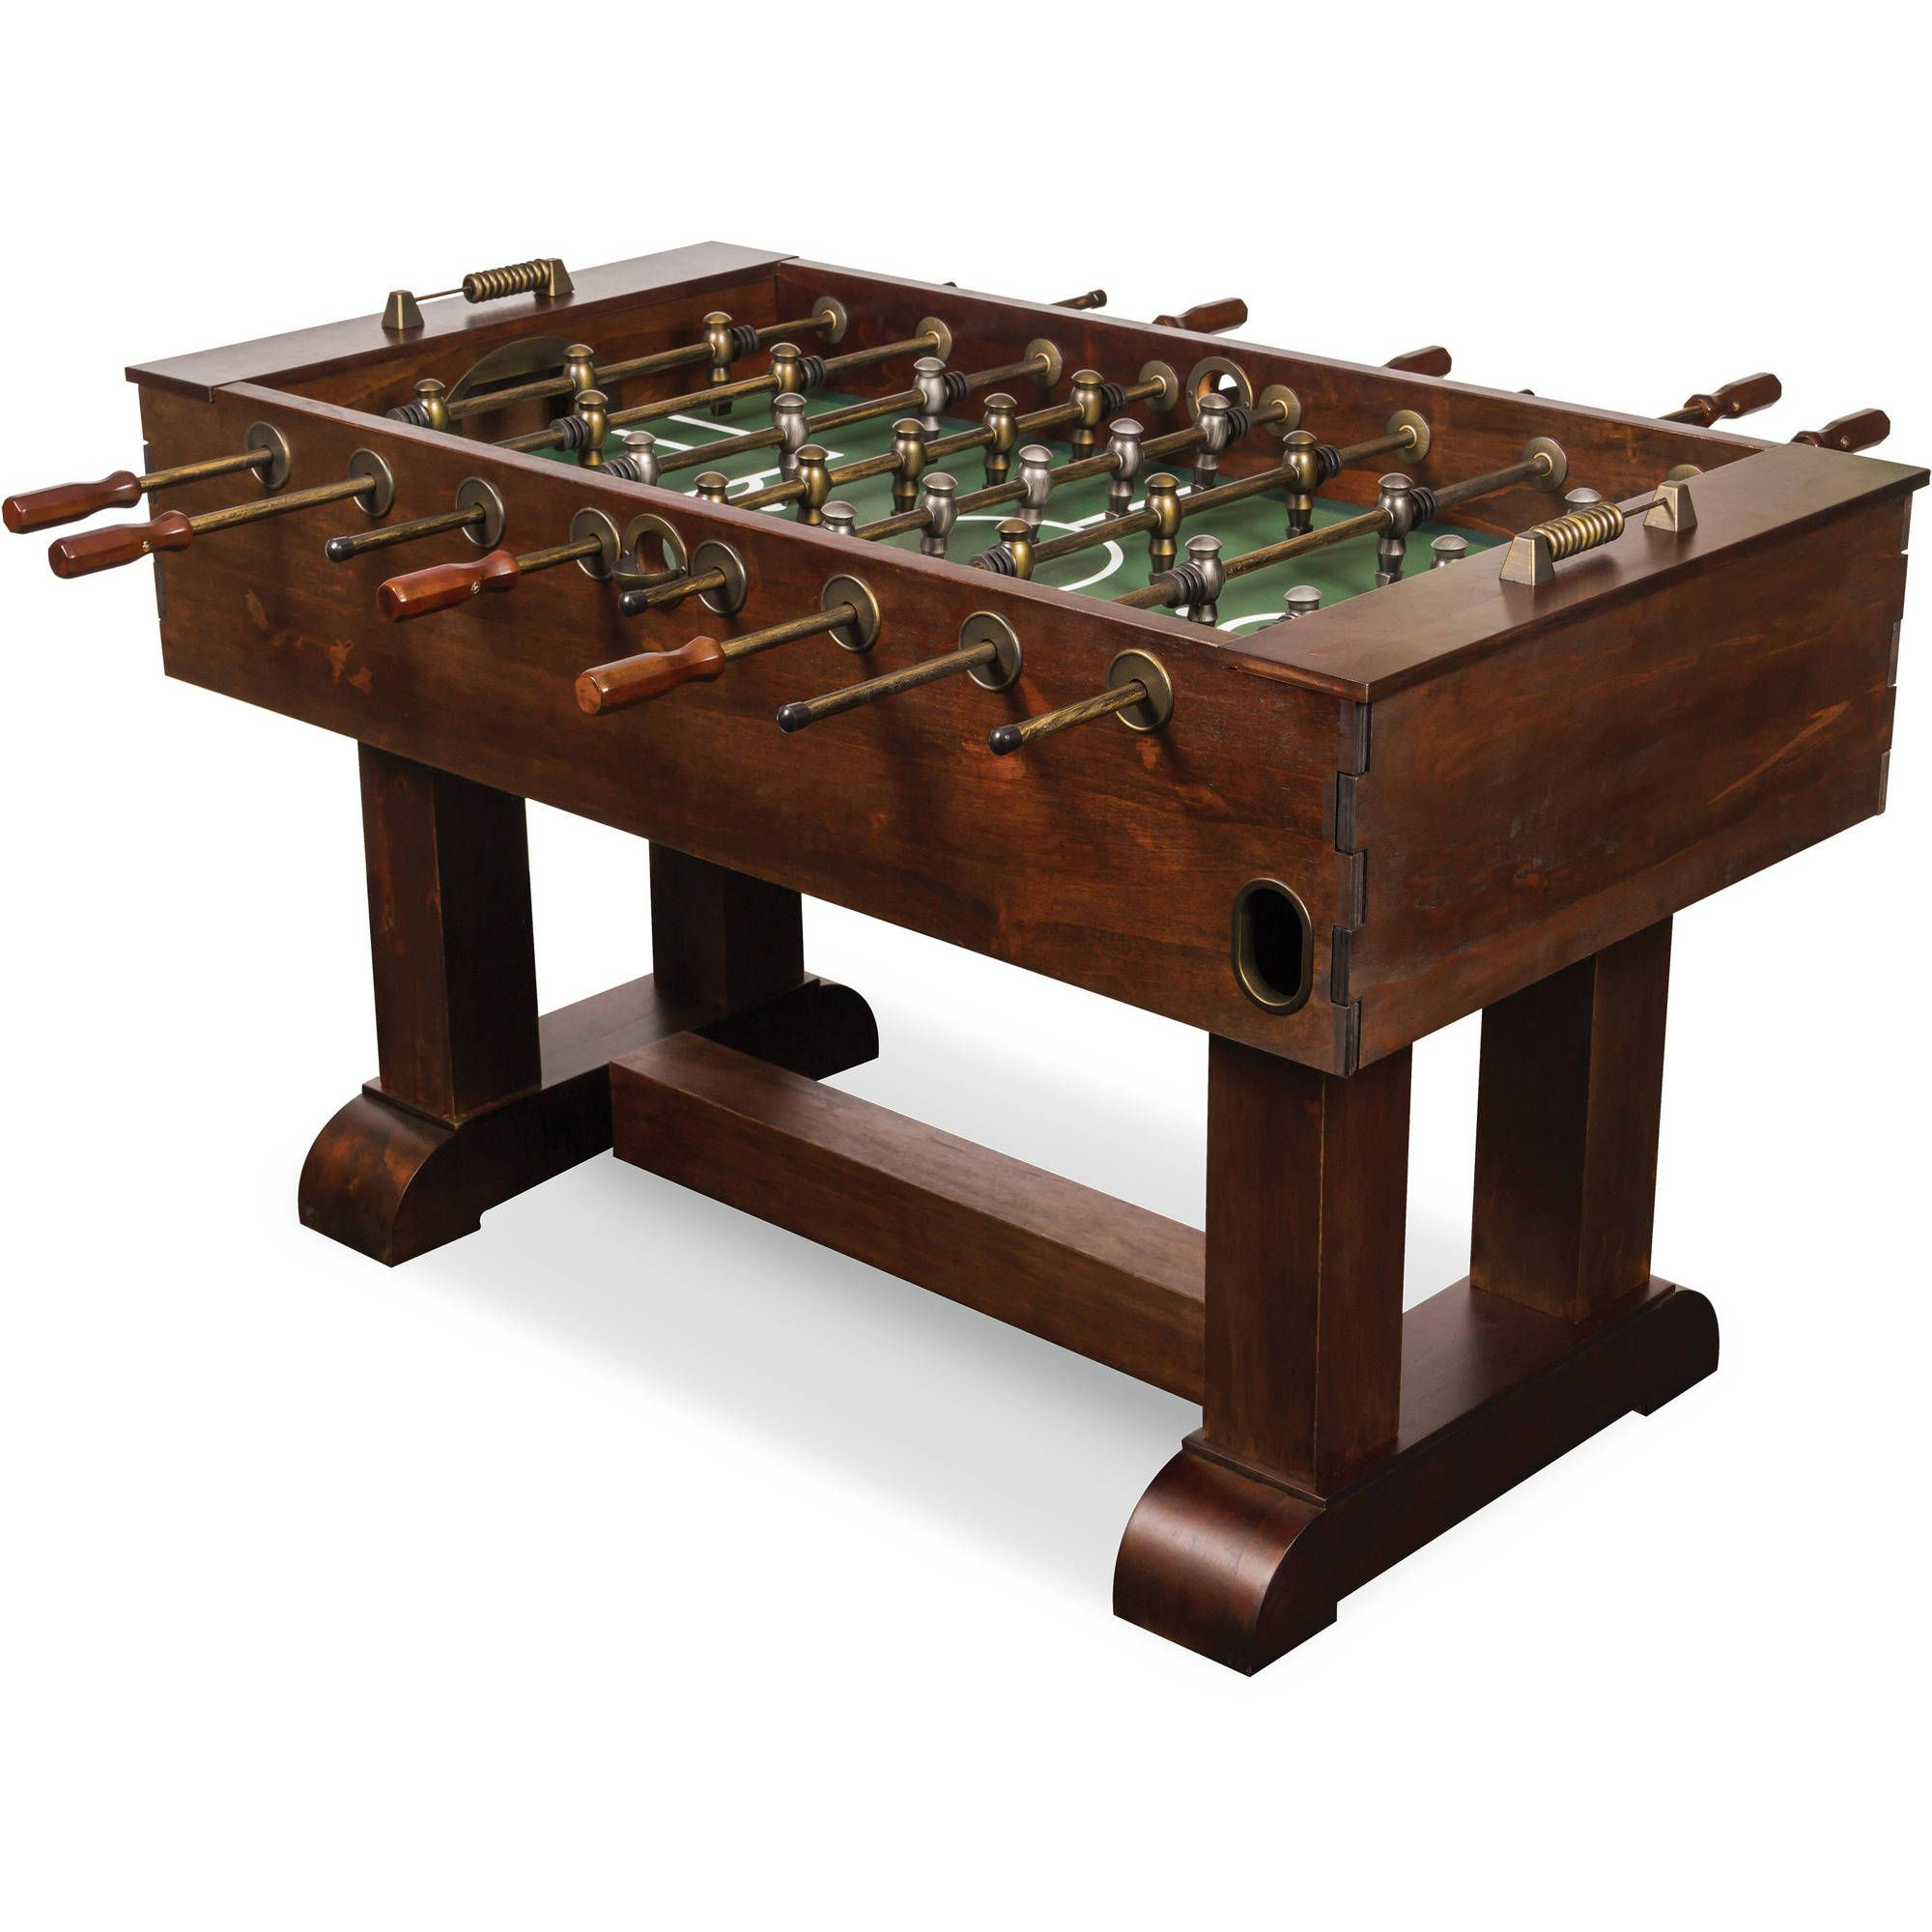 Barrington 56 Foosball Soccer Table With Bead Scoring Accessories Included Brown Walmart Com Foosball Table Foosball Game Room